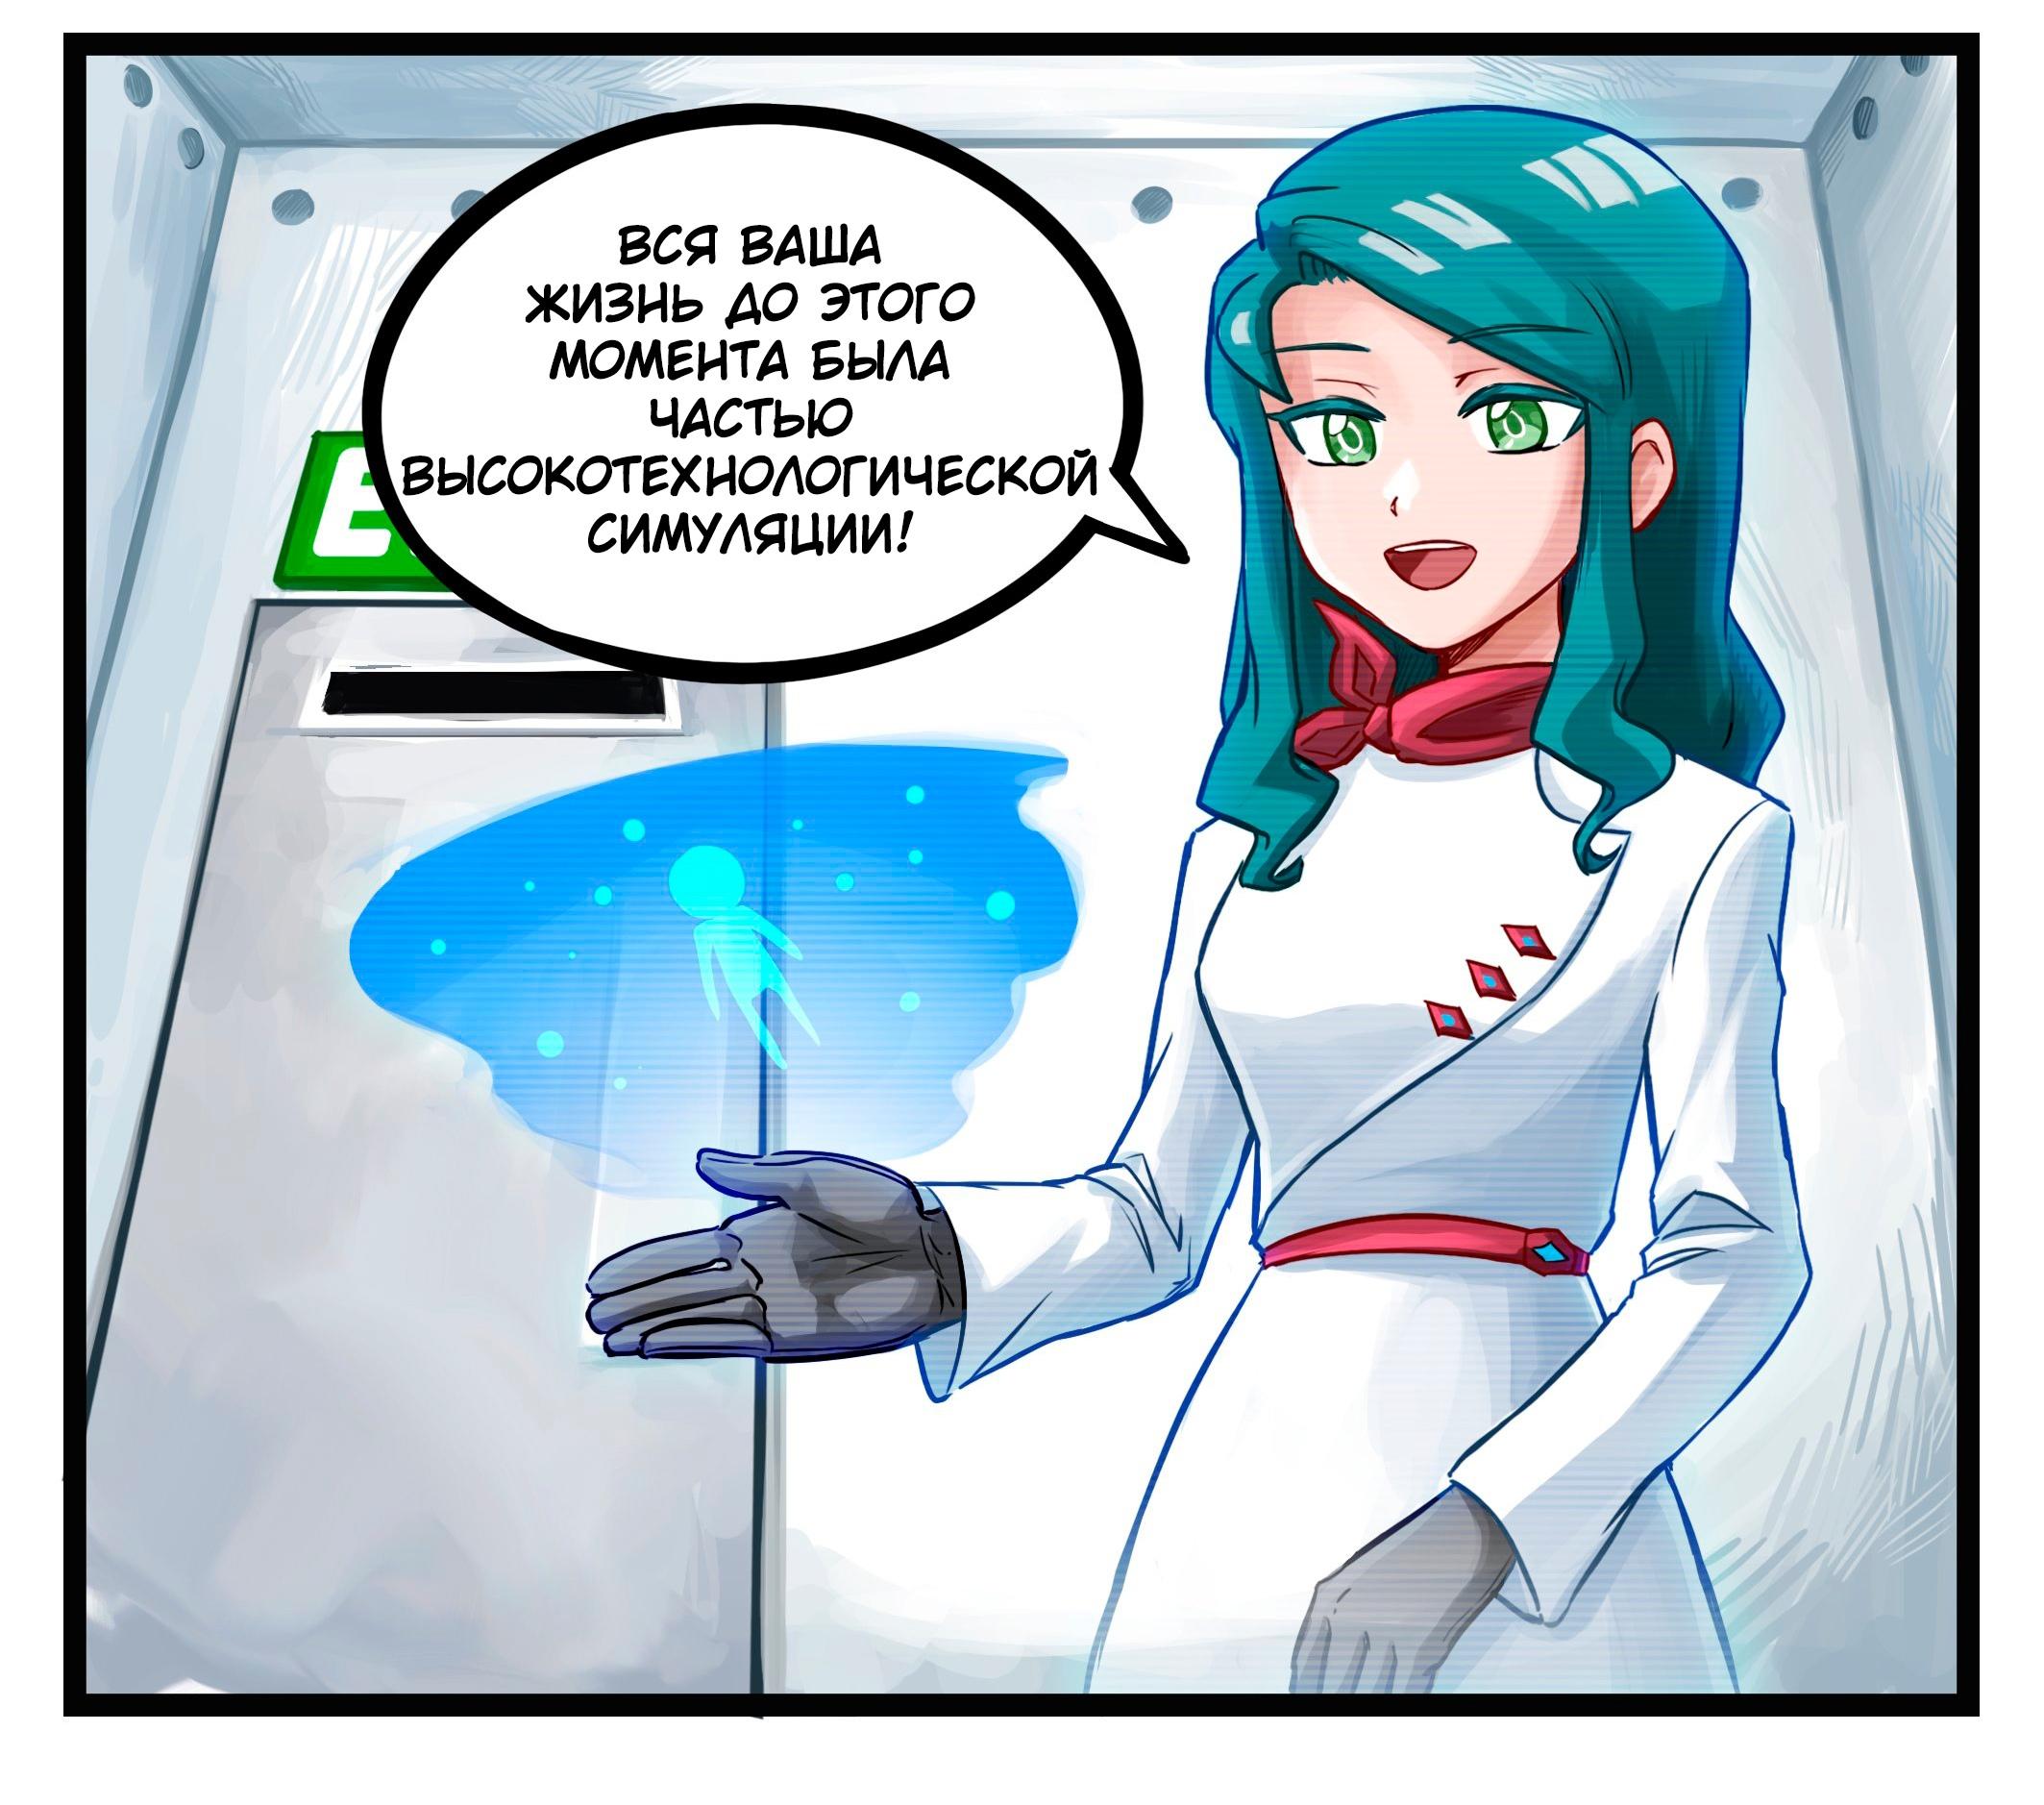 Клиника кошмаров - Эпизод 33: Машина симуляции жизни. Фрейм 2